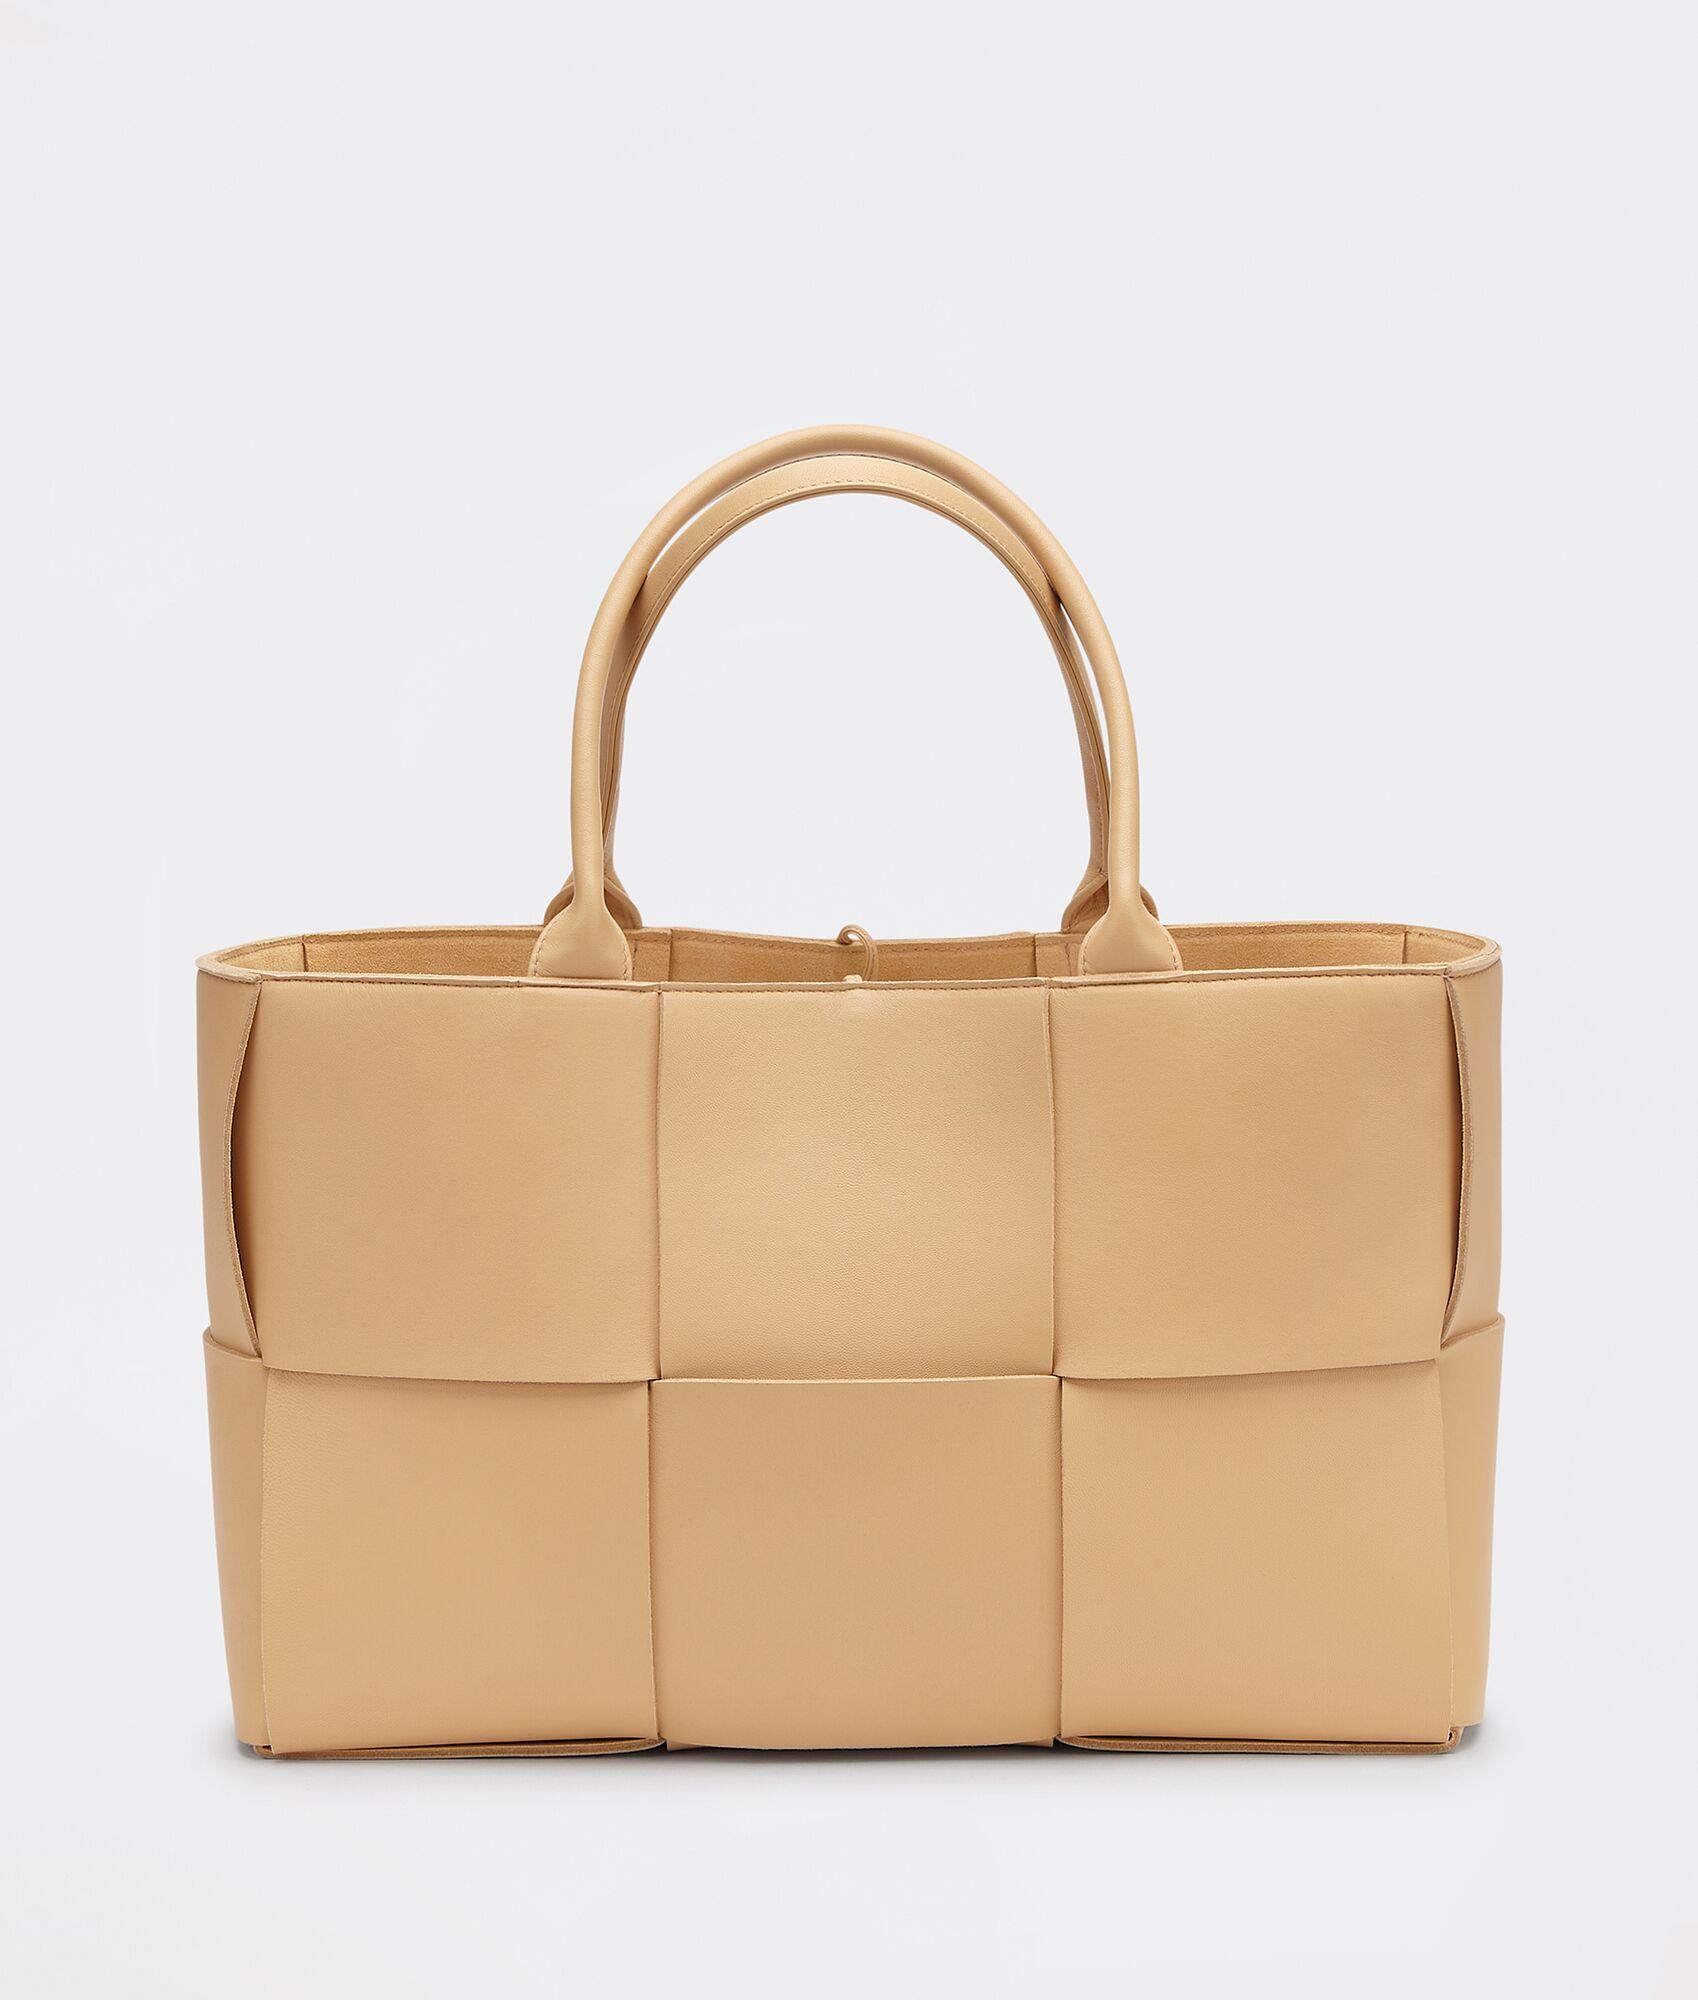 ARCO TOTE by Bottega Veneta, available on bottegaveneta.com for $2450 Olivia Culpo Bags Exact Product